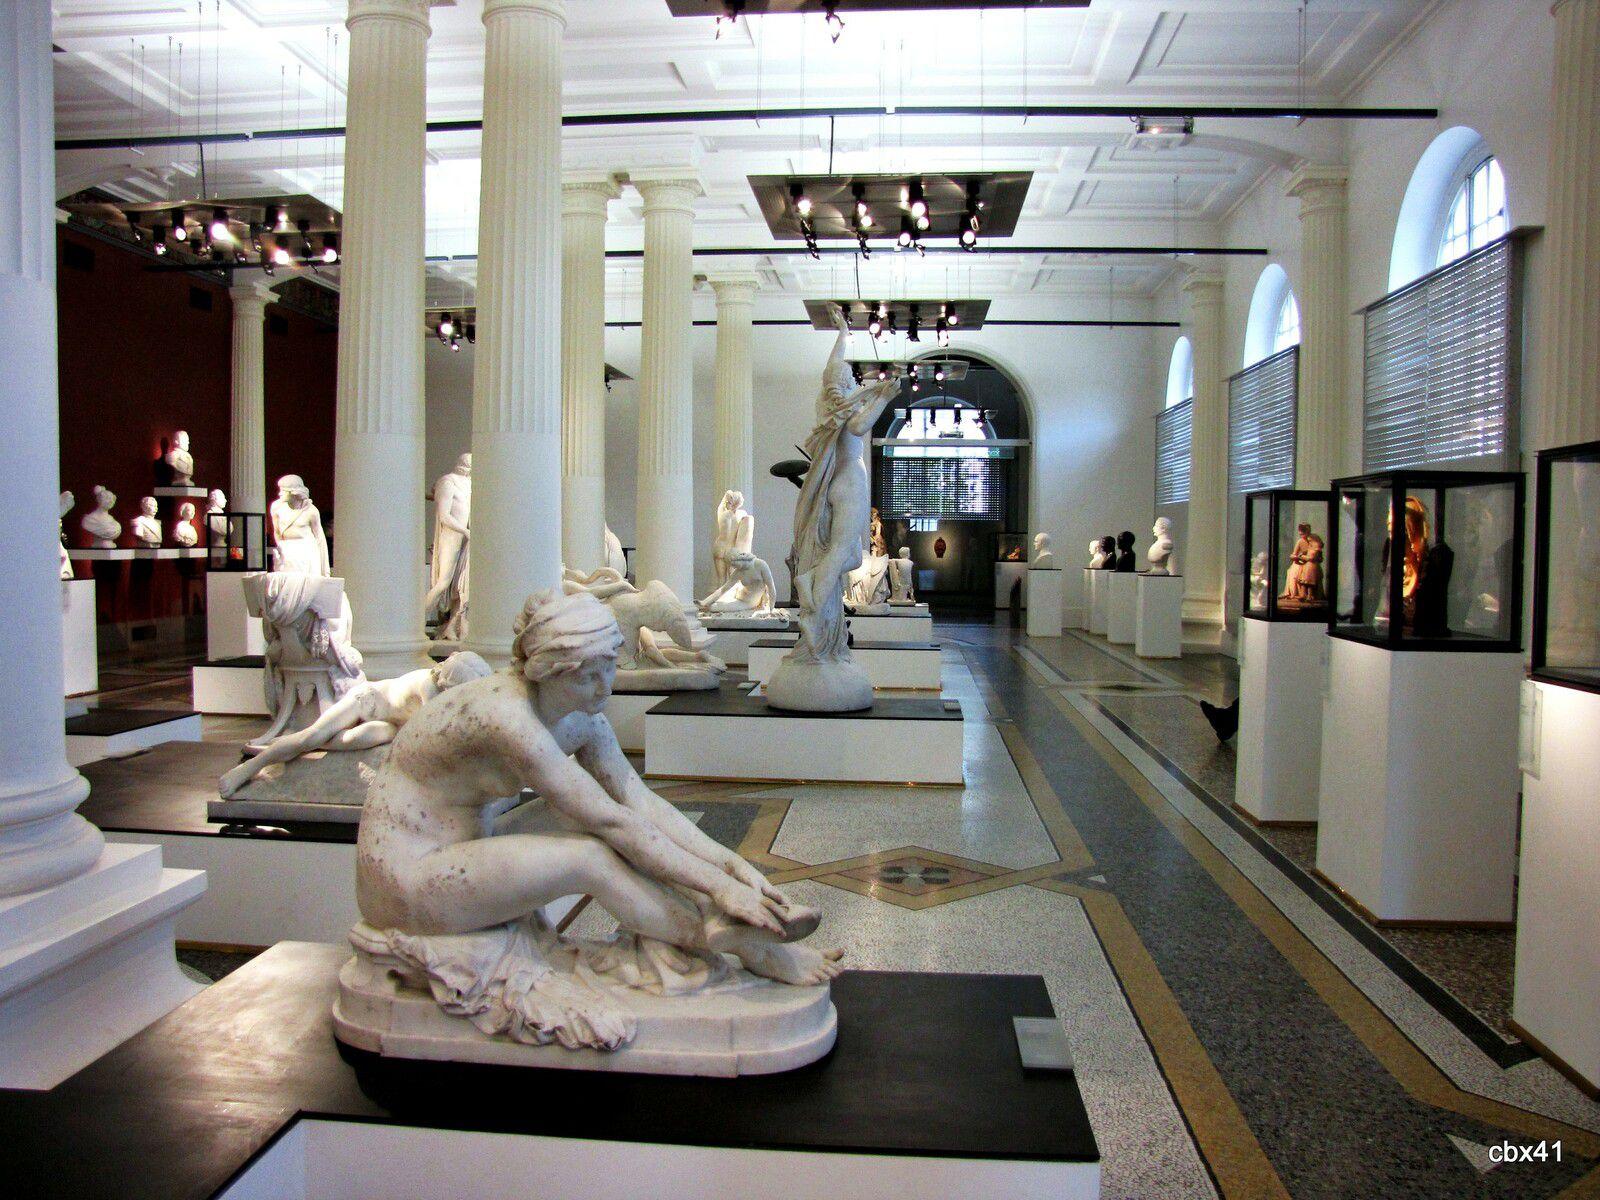 Alexandre Schoenewerk, Au matin (Musée de Picardie)